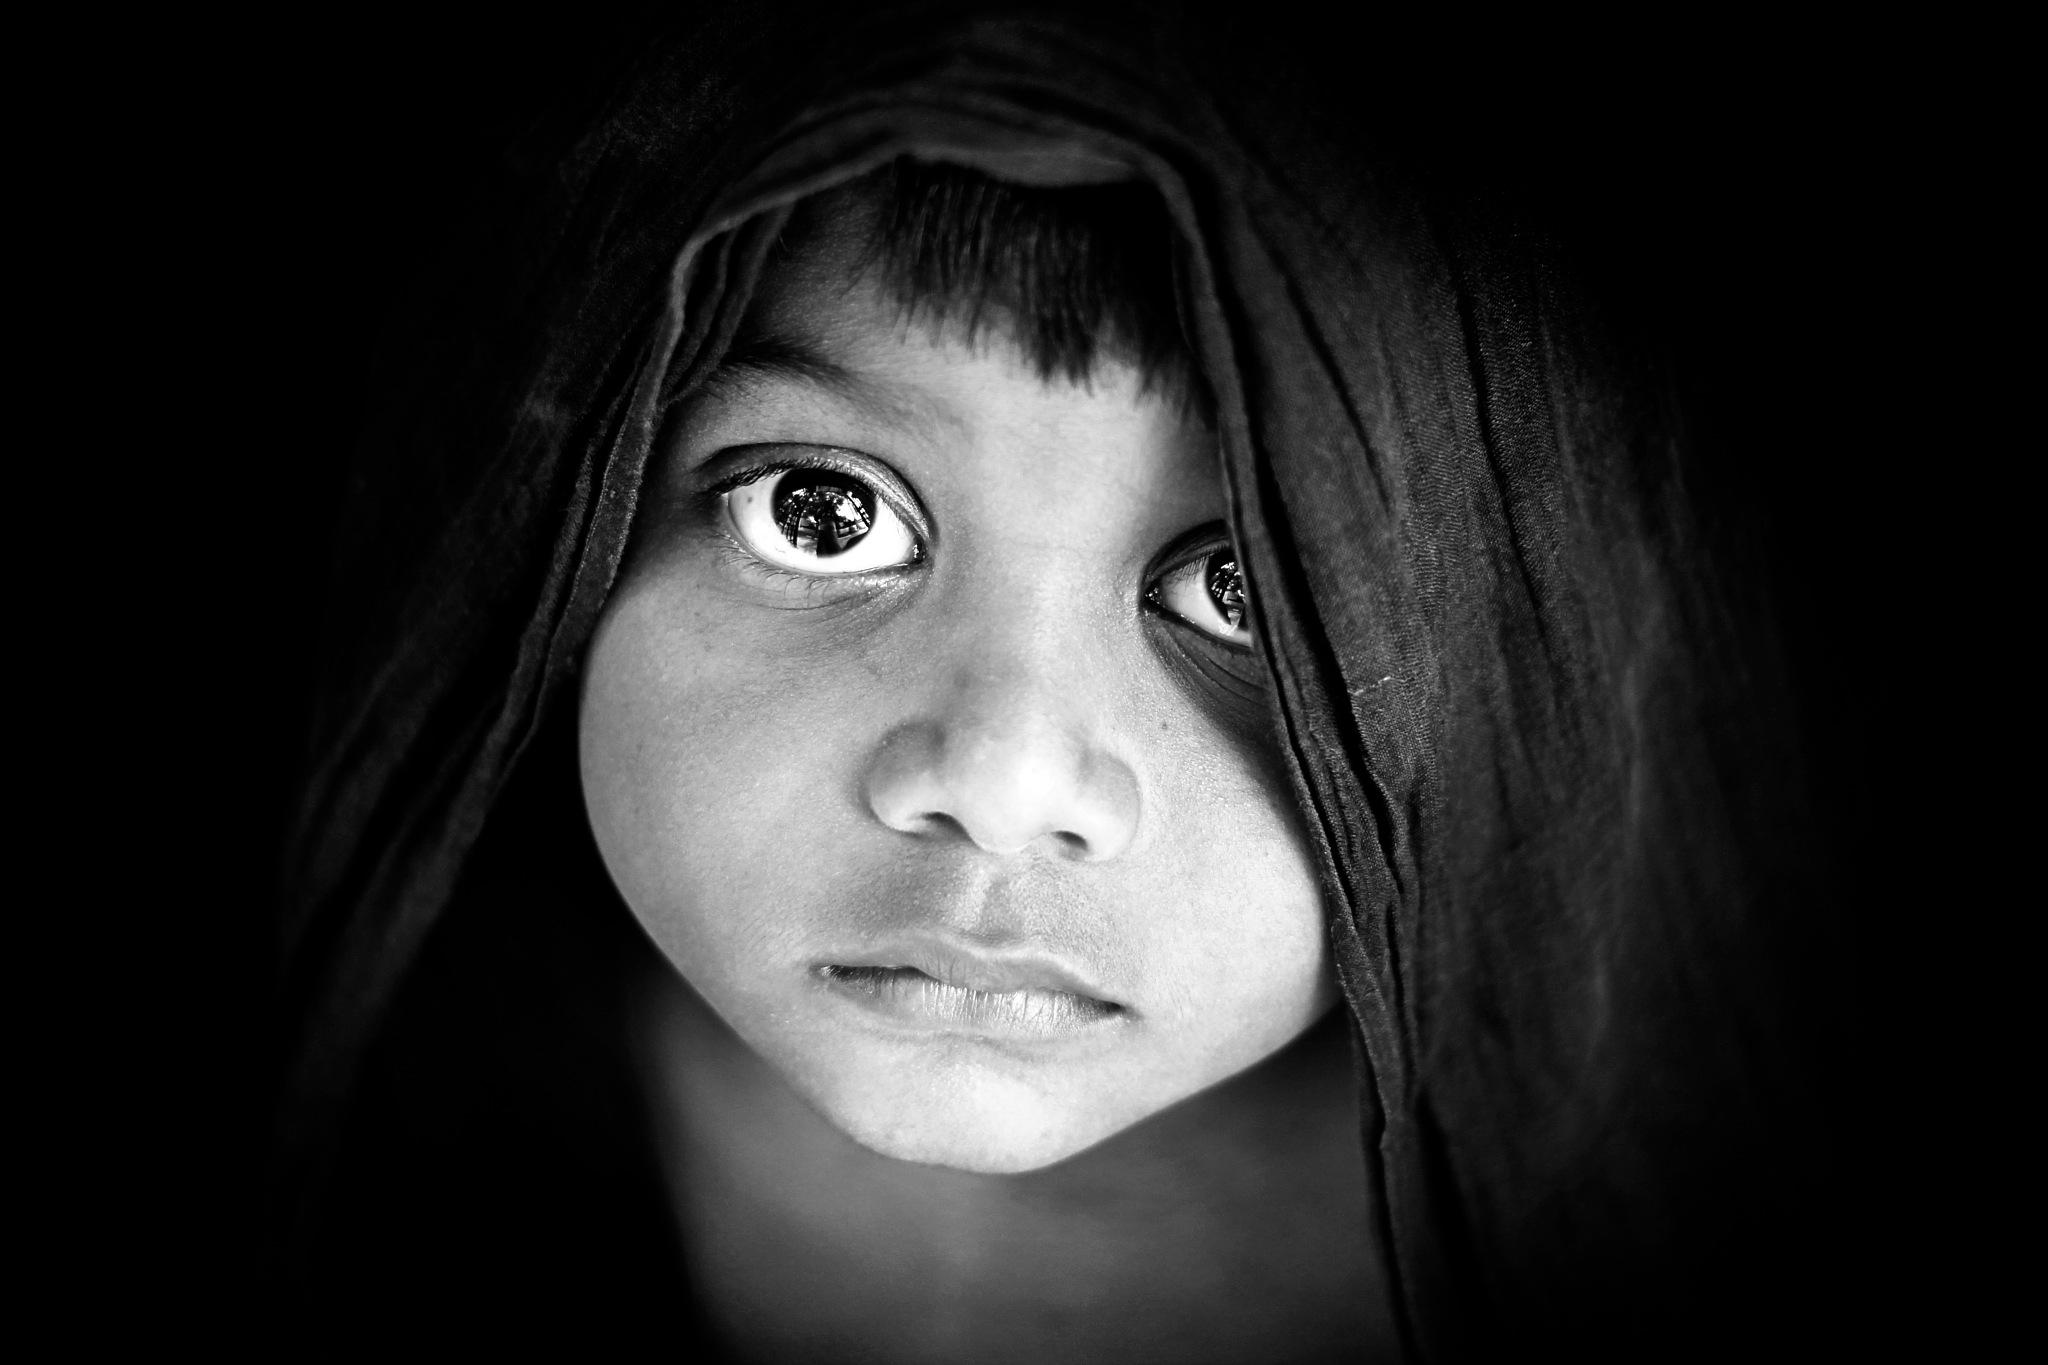 . Innocence . by Radhakrishna Rao